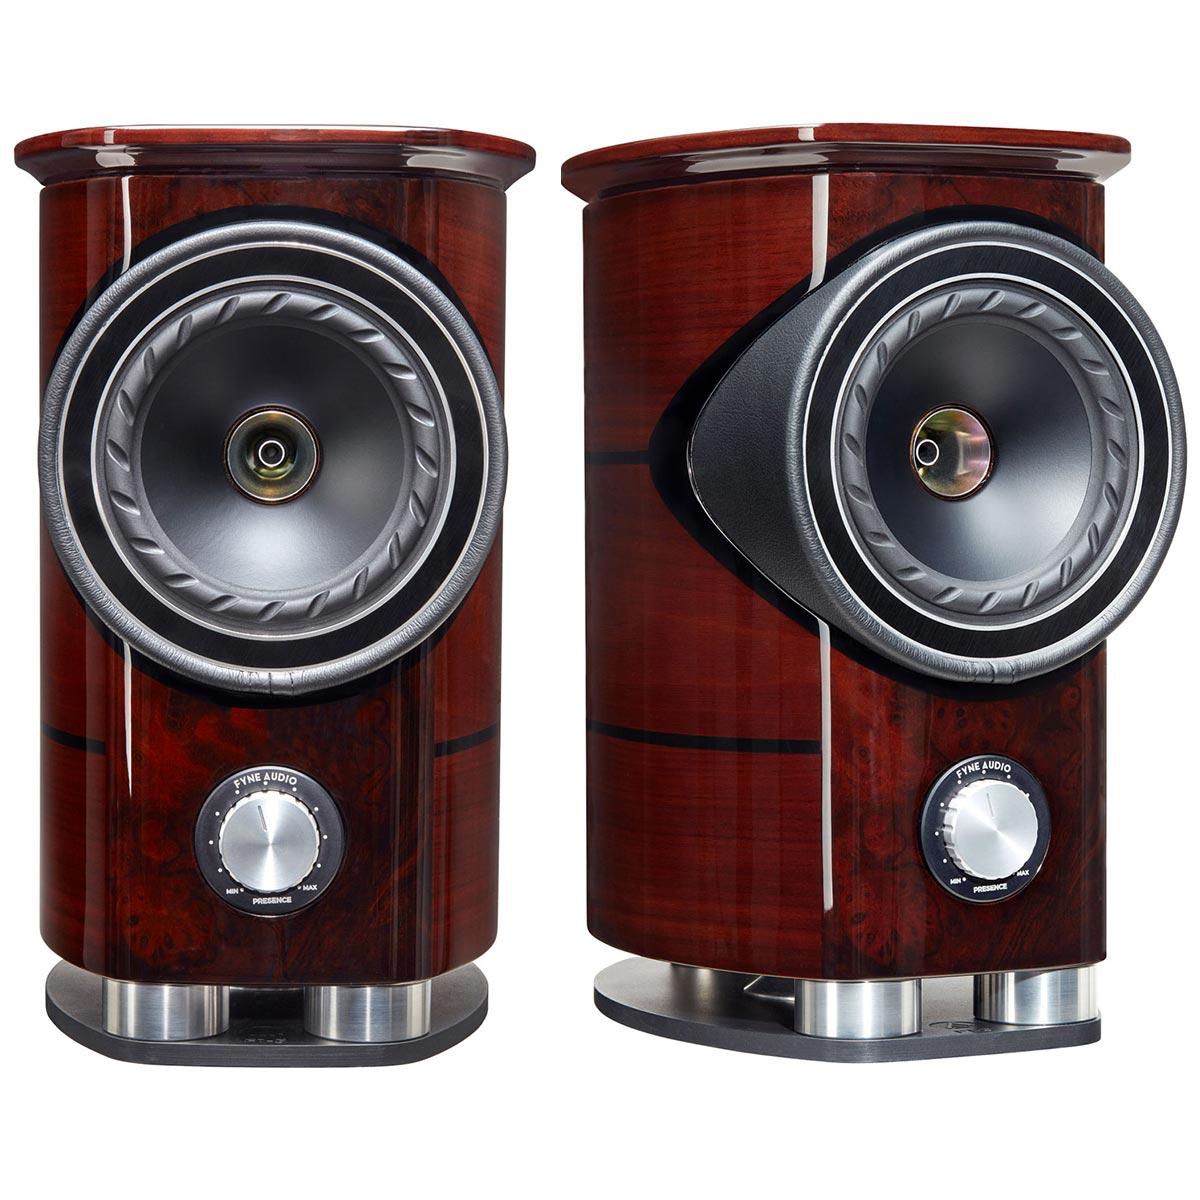 Полочная акустика Fyne Audio F1-5 Piano Gloss Walnut